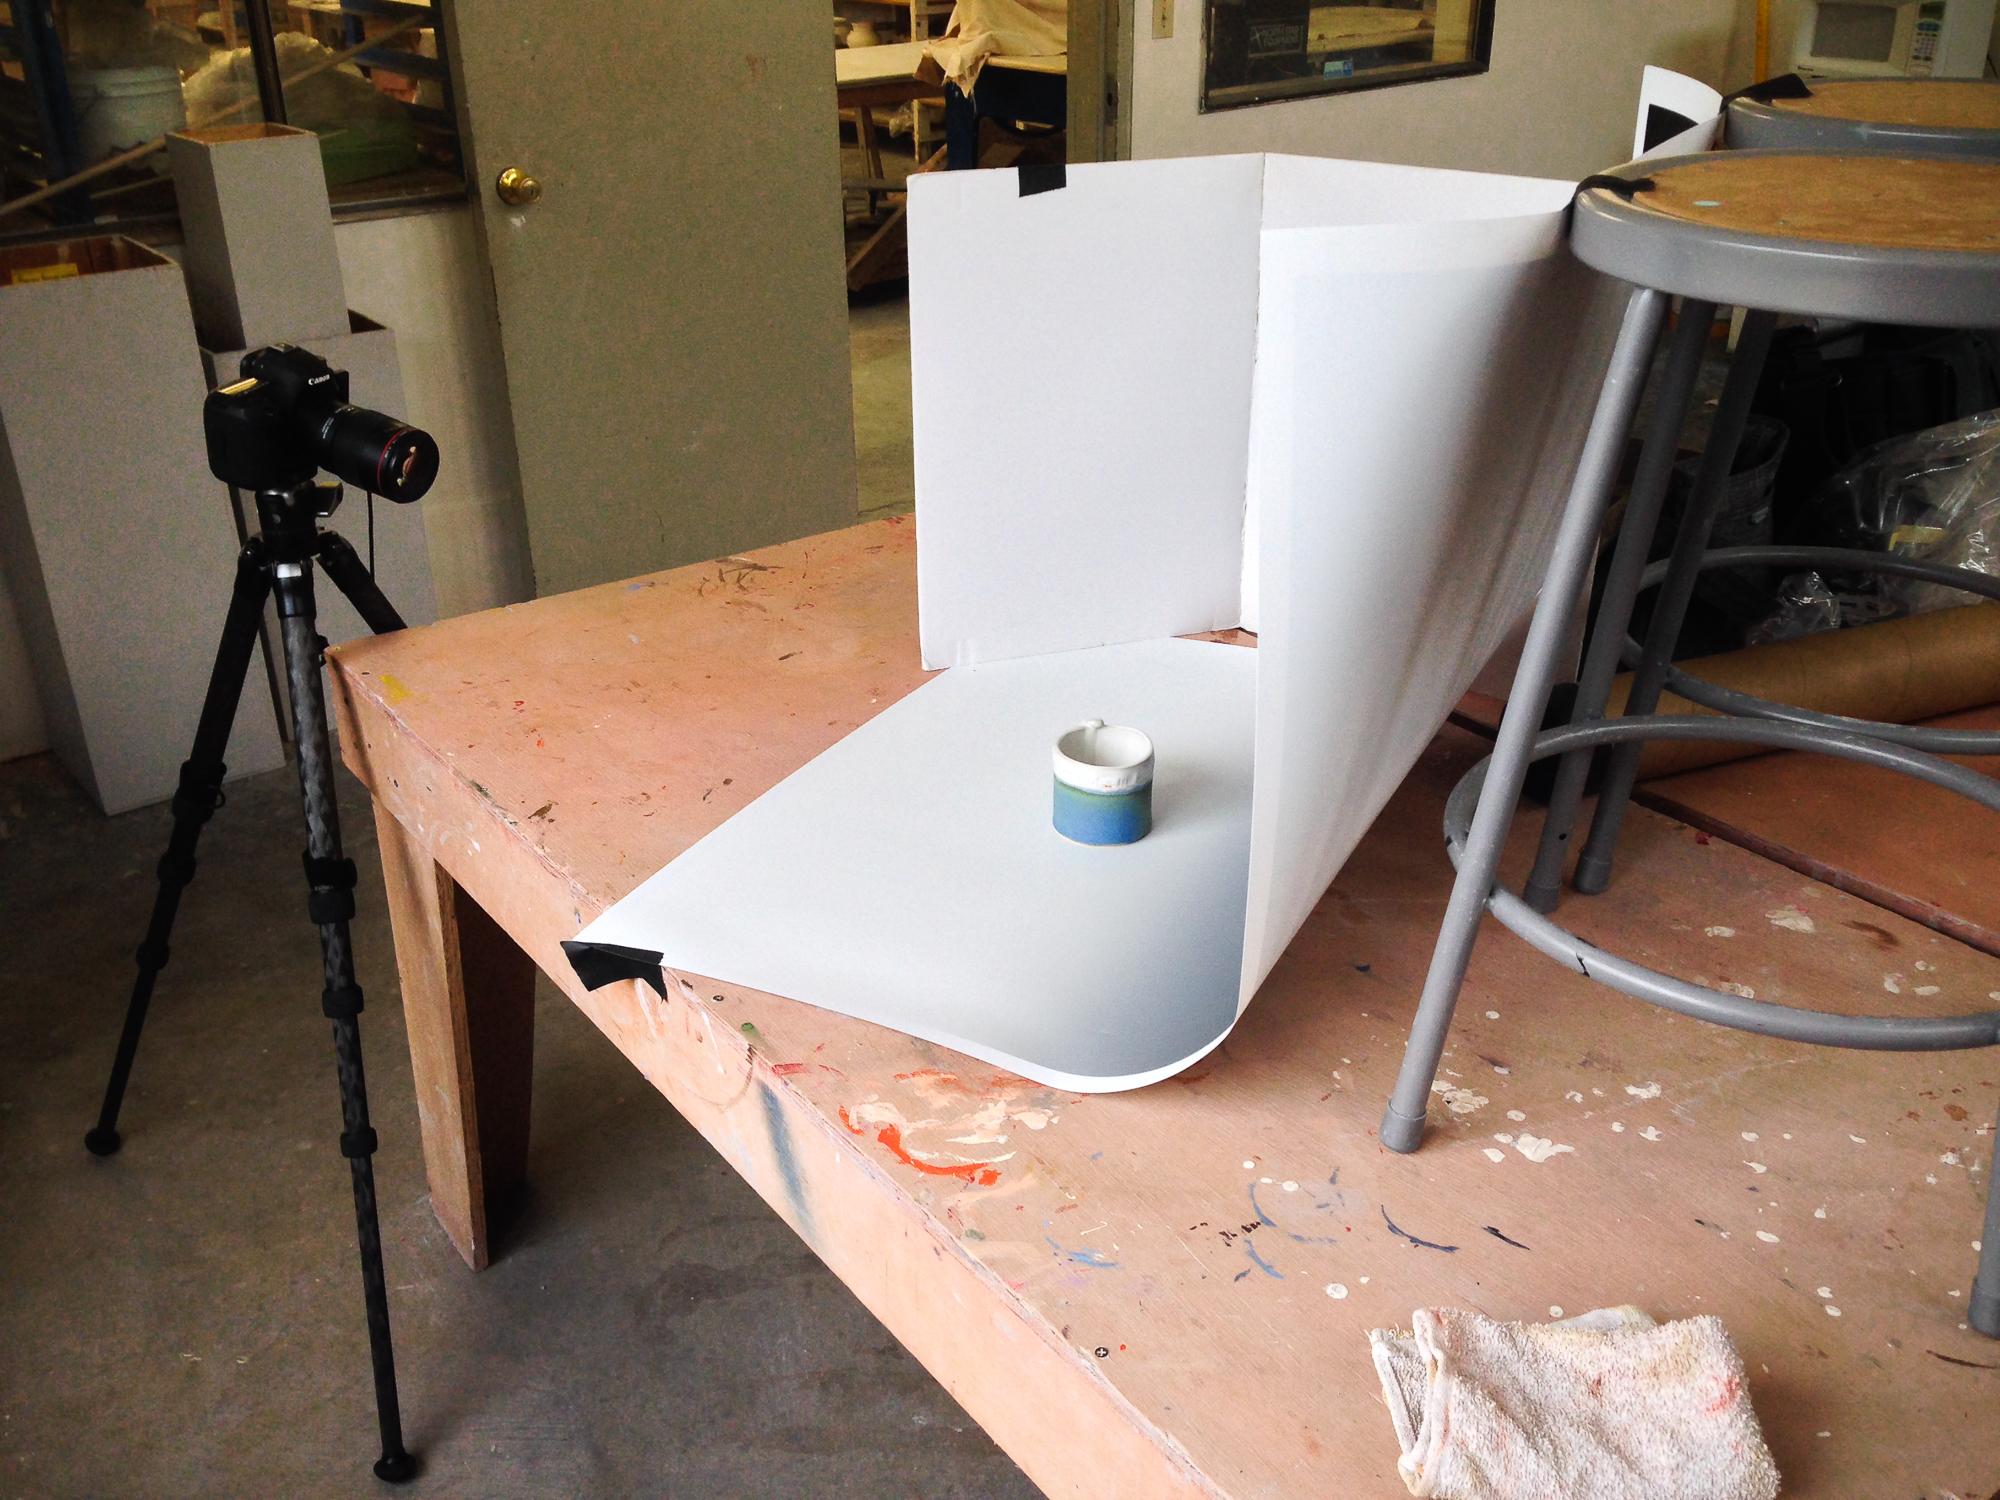 Photography Studio Setup Product Iphone Jul